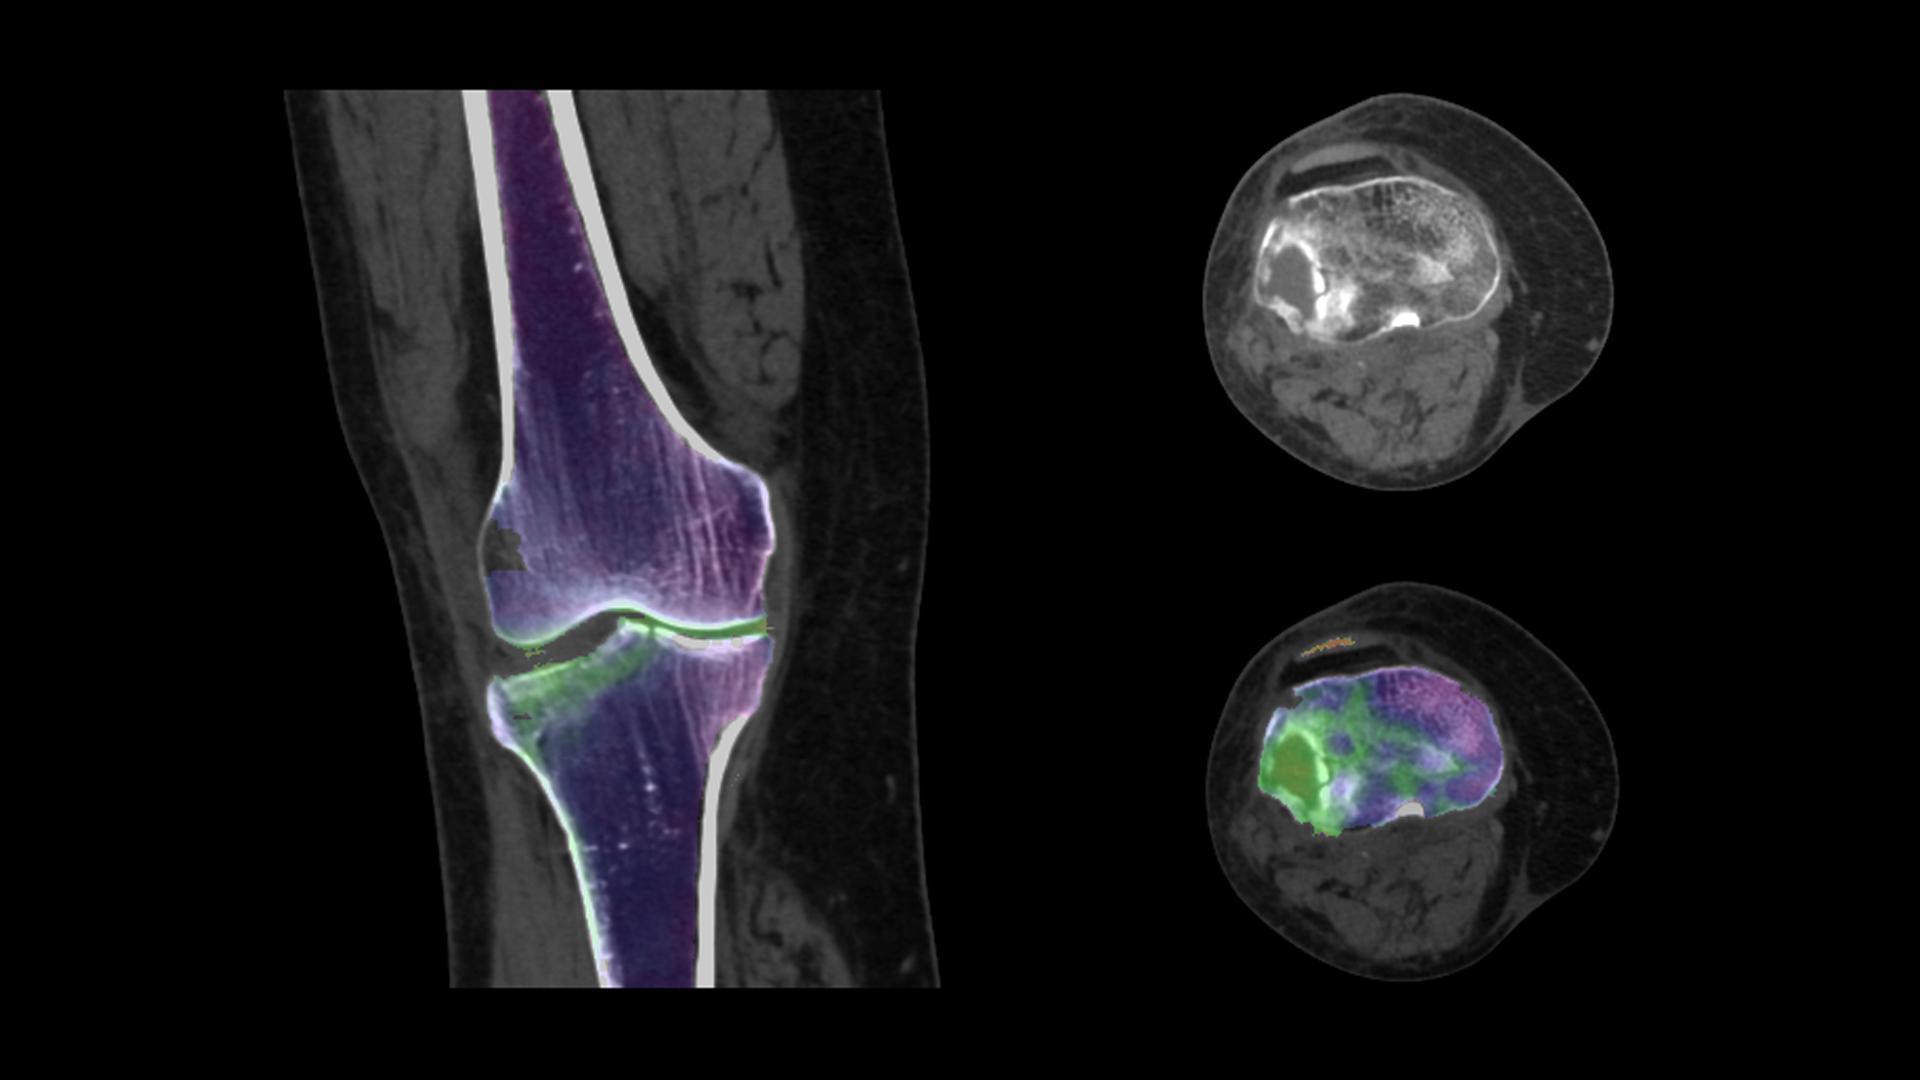 Spectral assessment of bone marrow